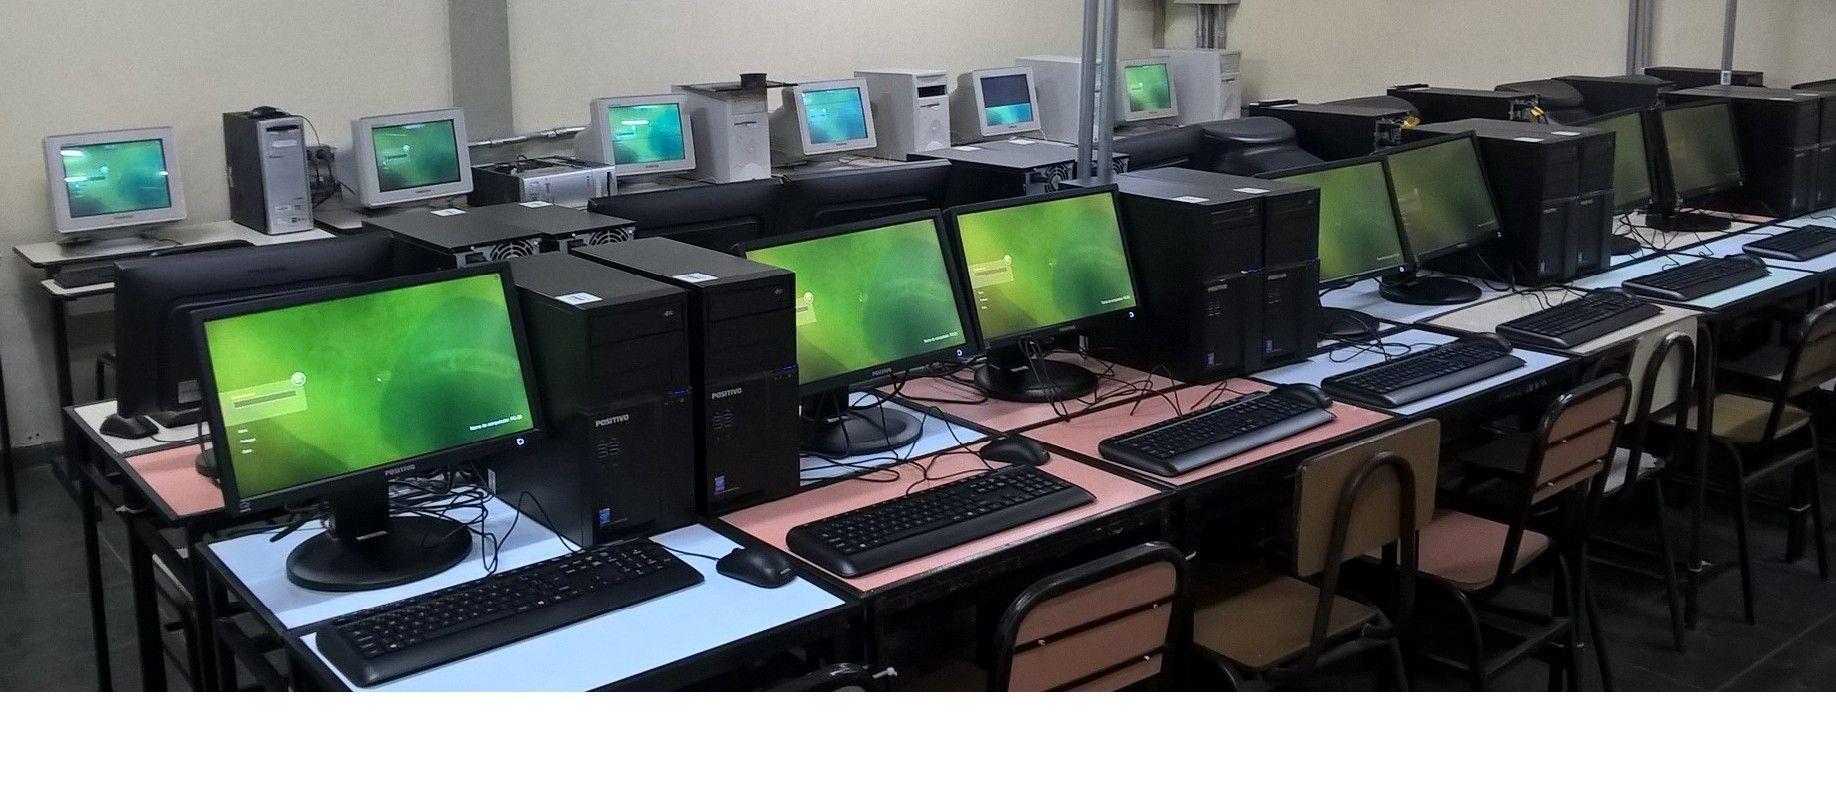 Rede Linux escola pública